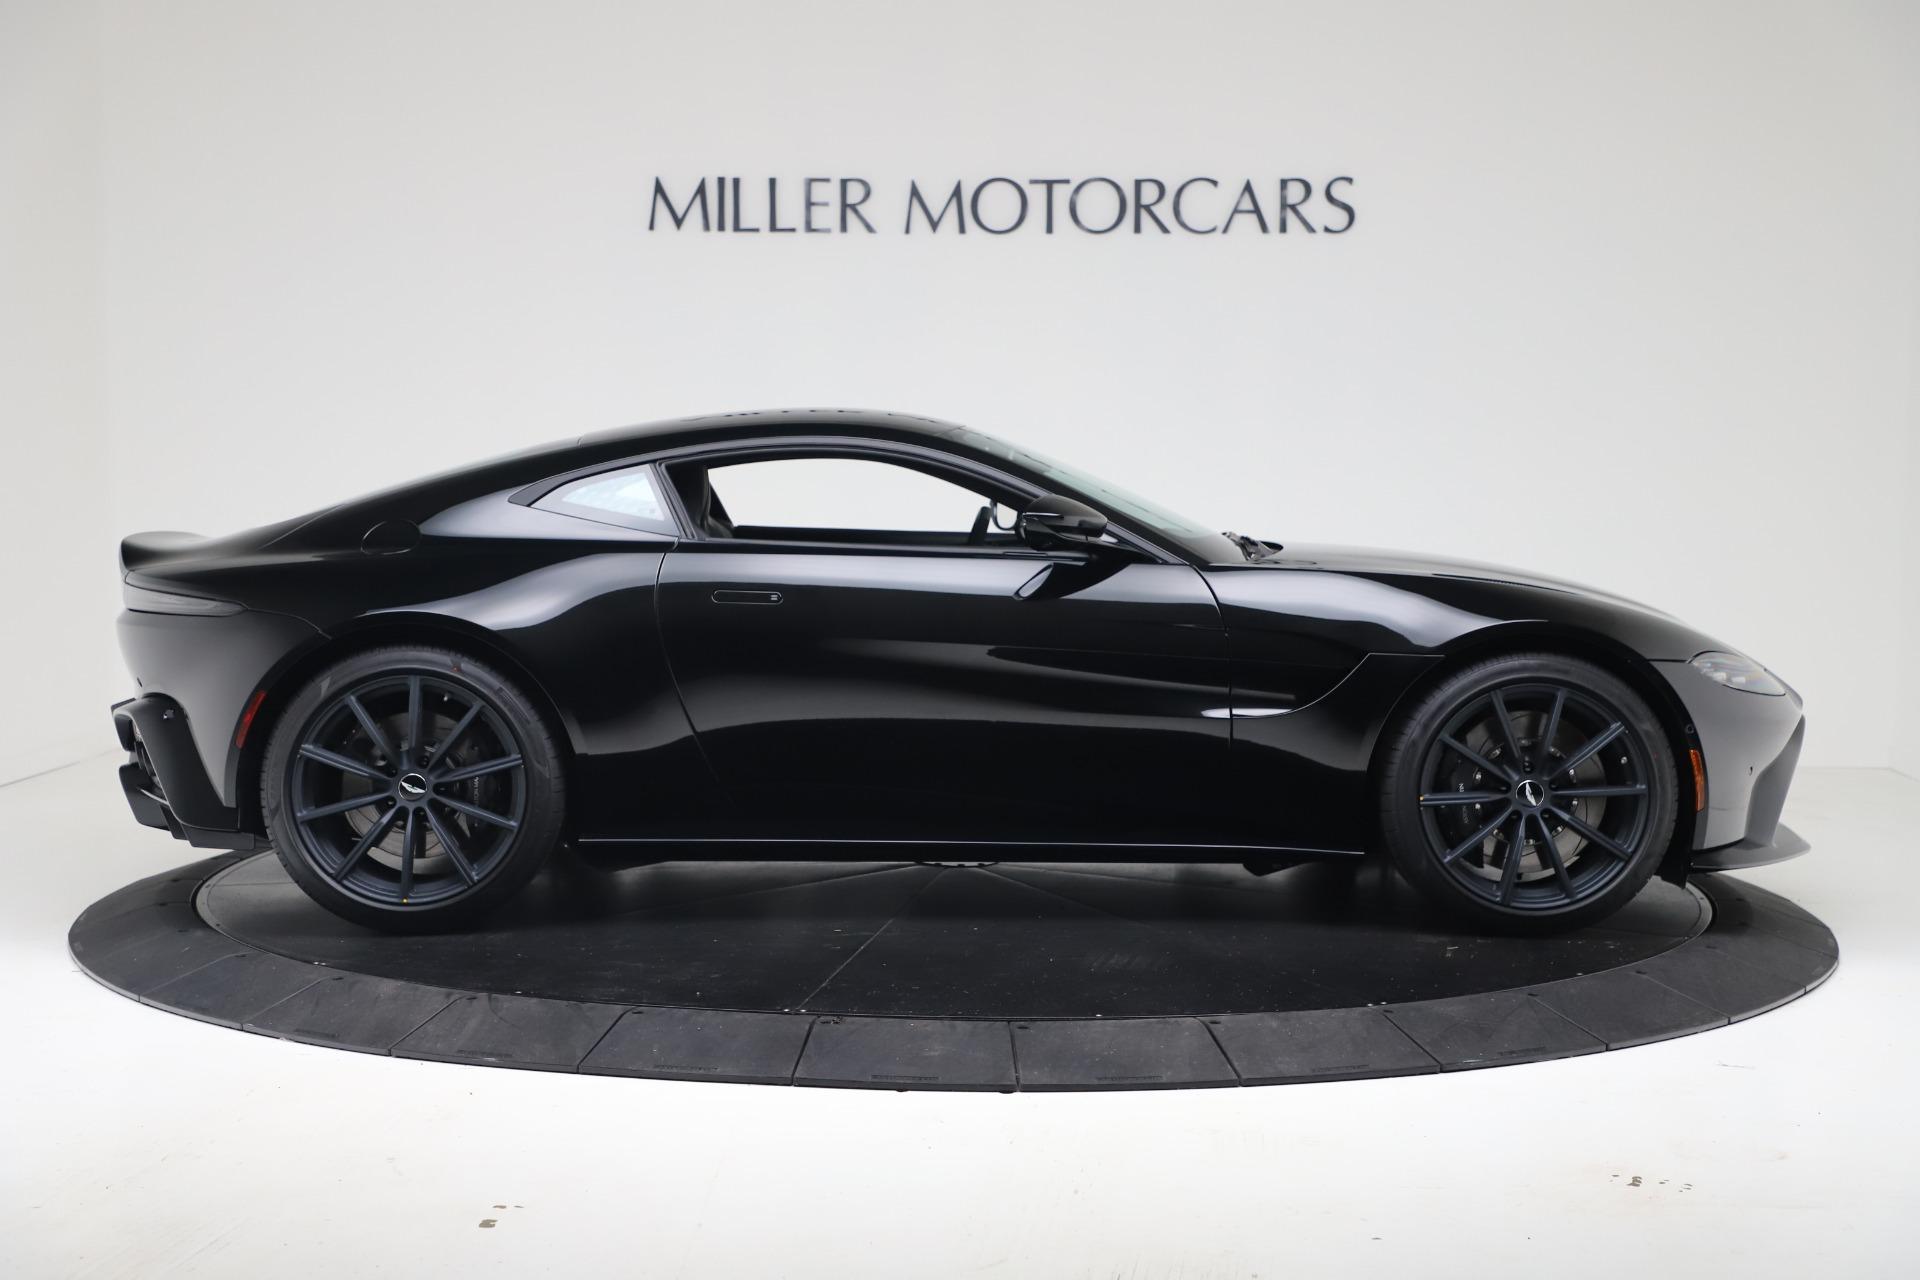 New 2020 Aston Martin Vantage V8 For Sale In Westport, CT 3547_p6